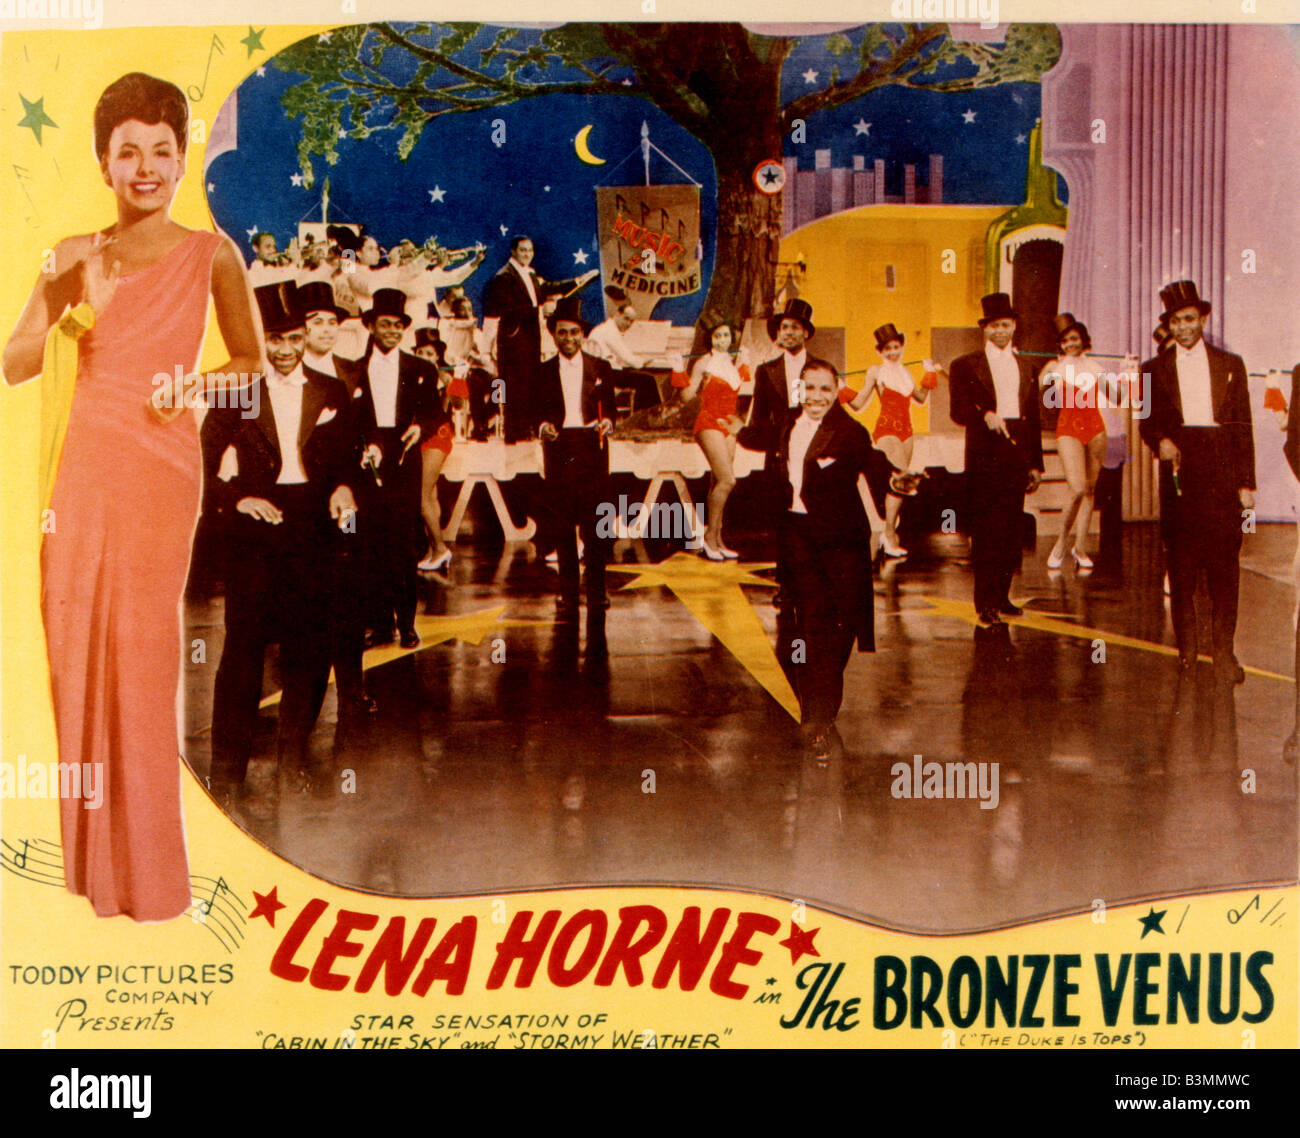 THE BRONZE VENUS aka THE DUKE IS TOPS 1938 Million Dollars Productions film musical - Stock Image